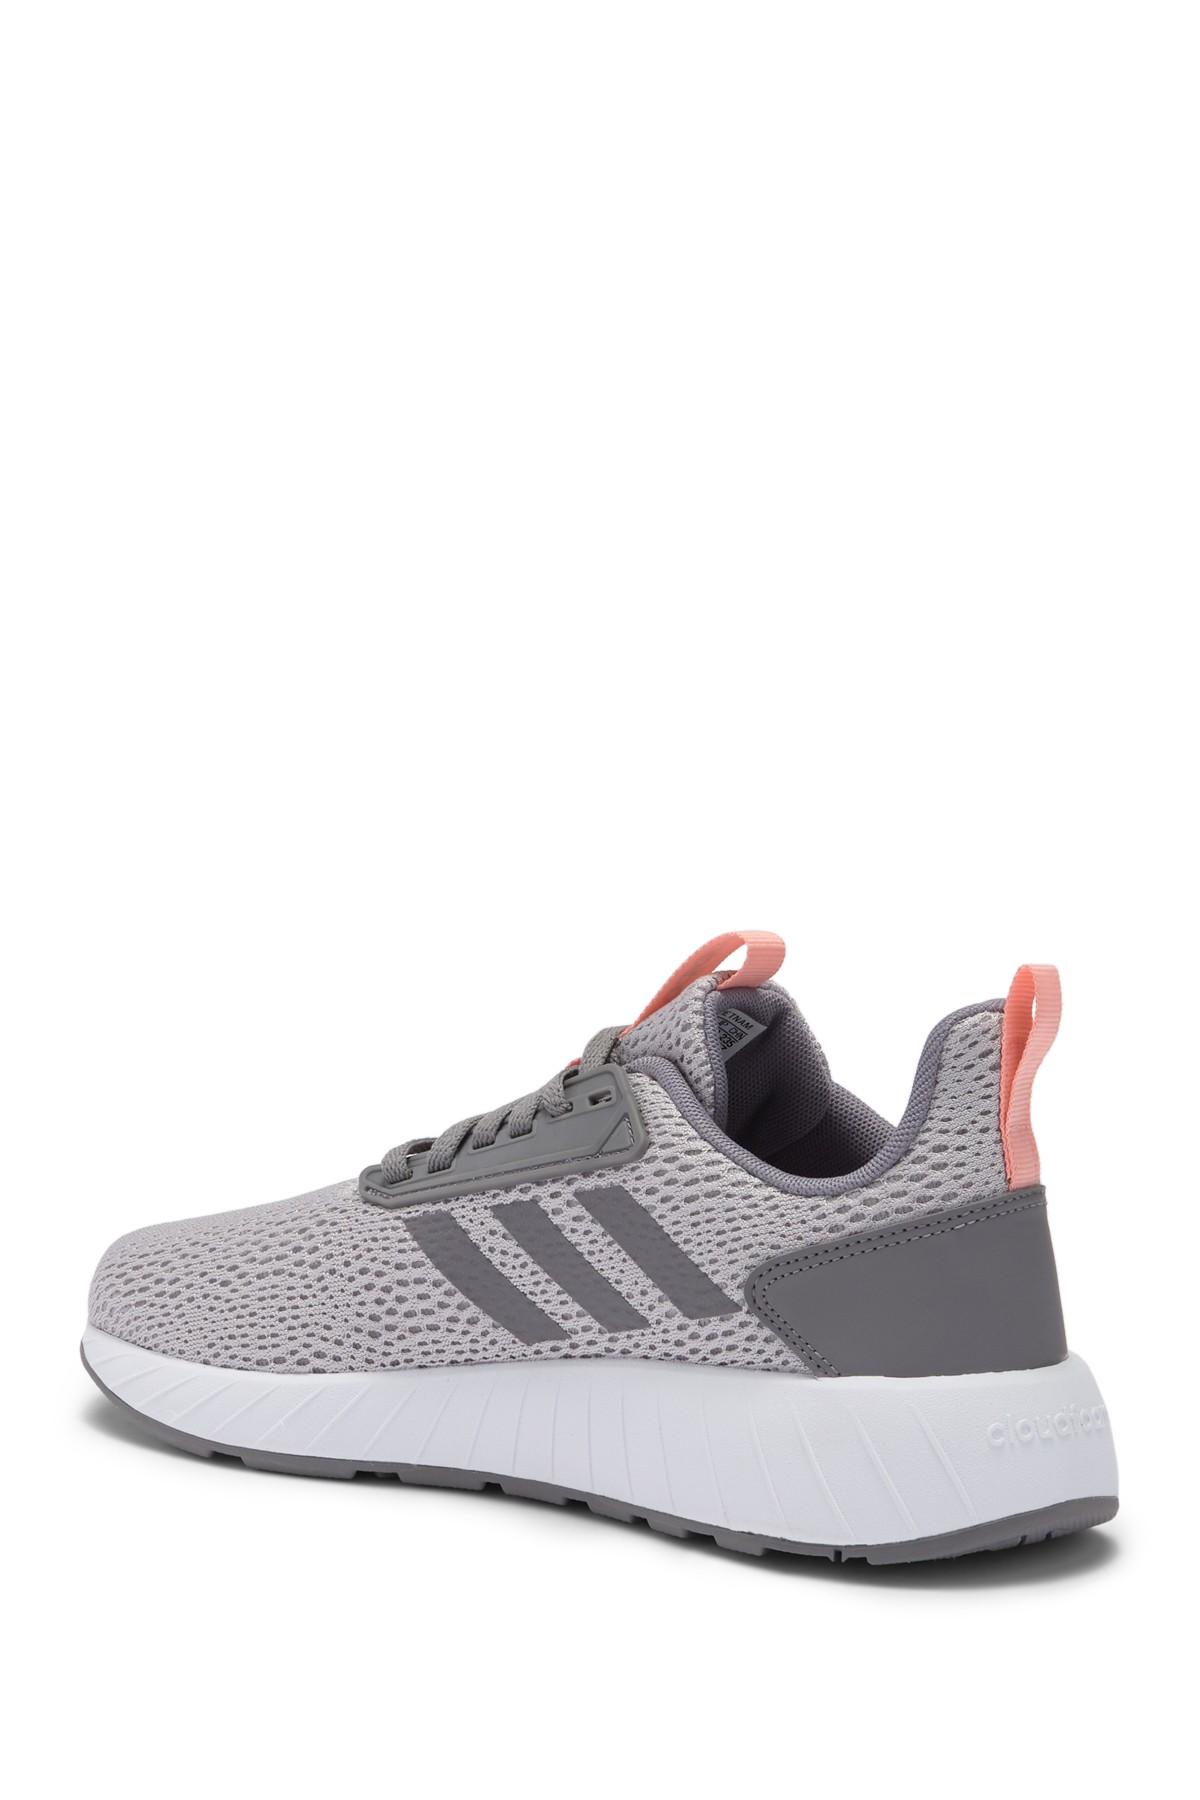 Adidas Damenschuhe Questar Drive Fabric Running Niedrig Top Lace Up Running Fabric Sneaker ed75d6